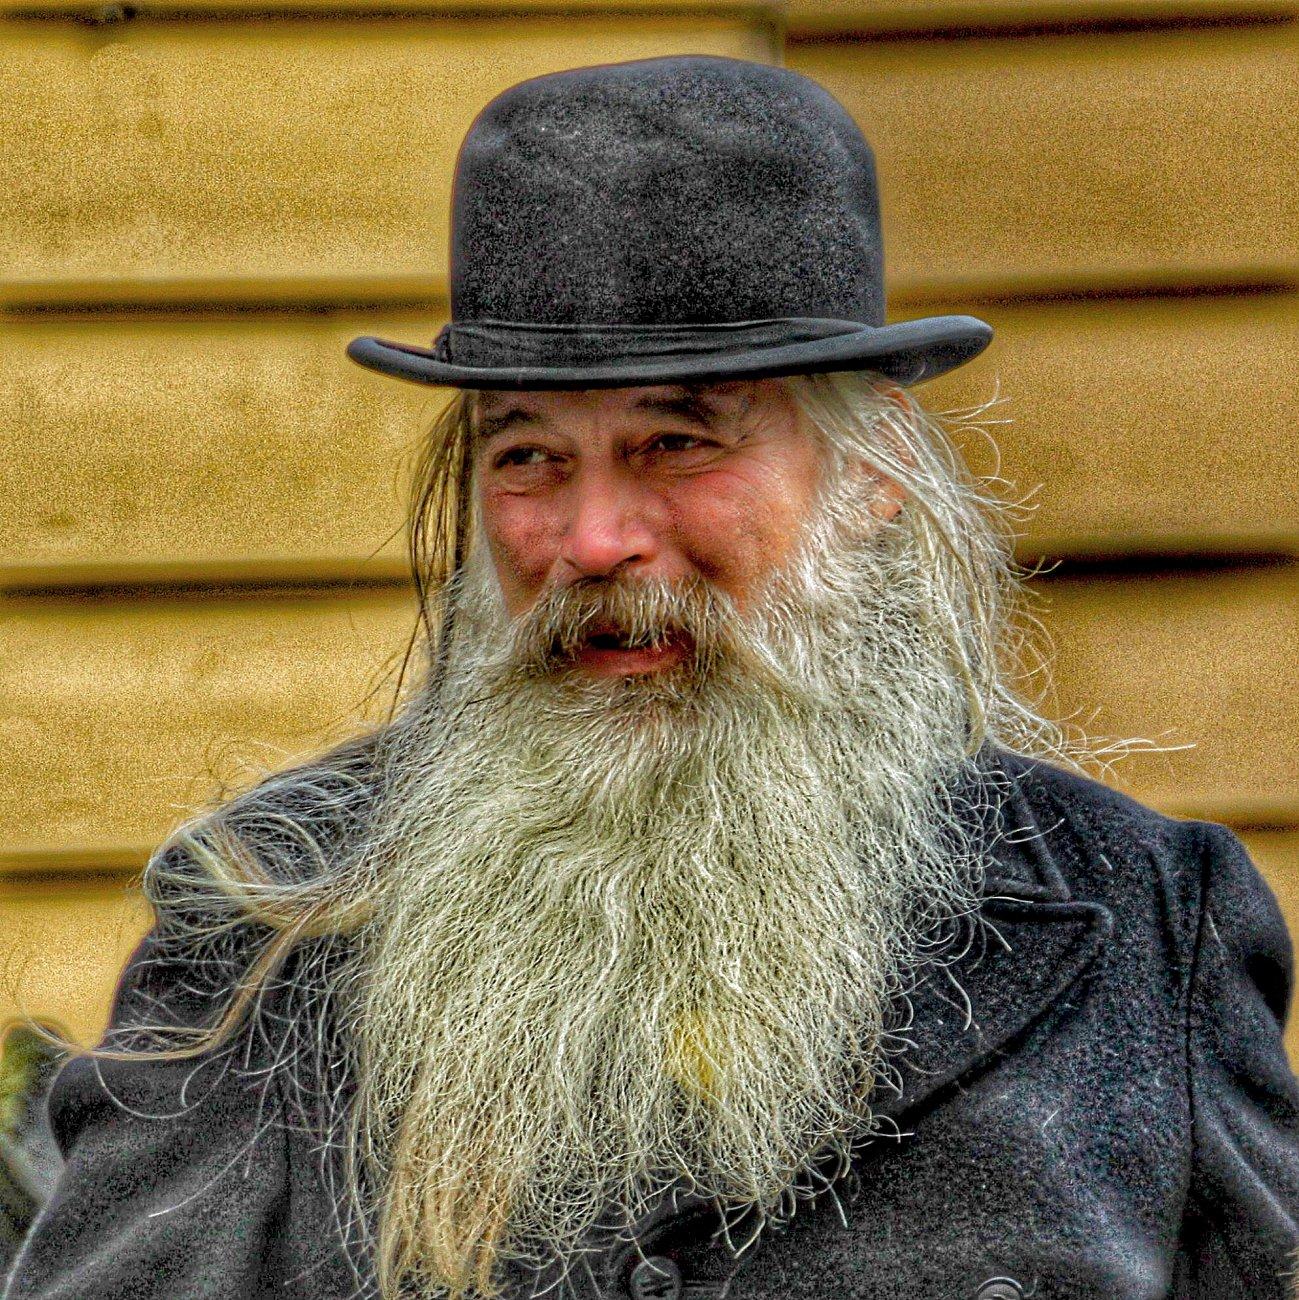 Lockdown beard.